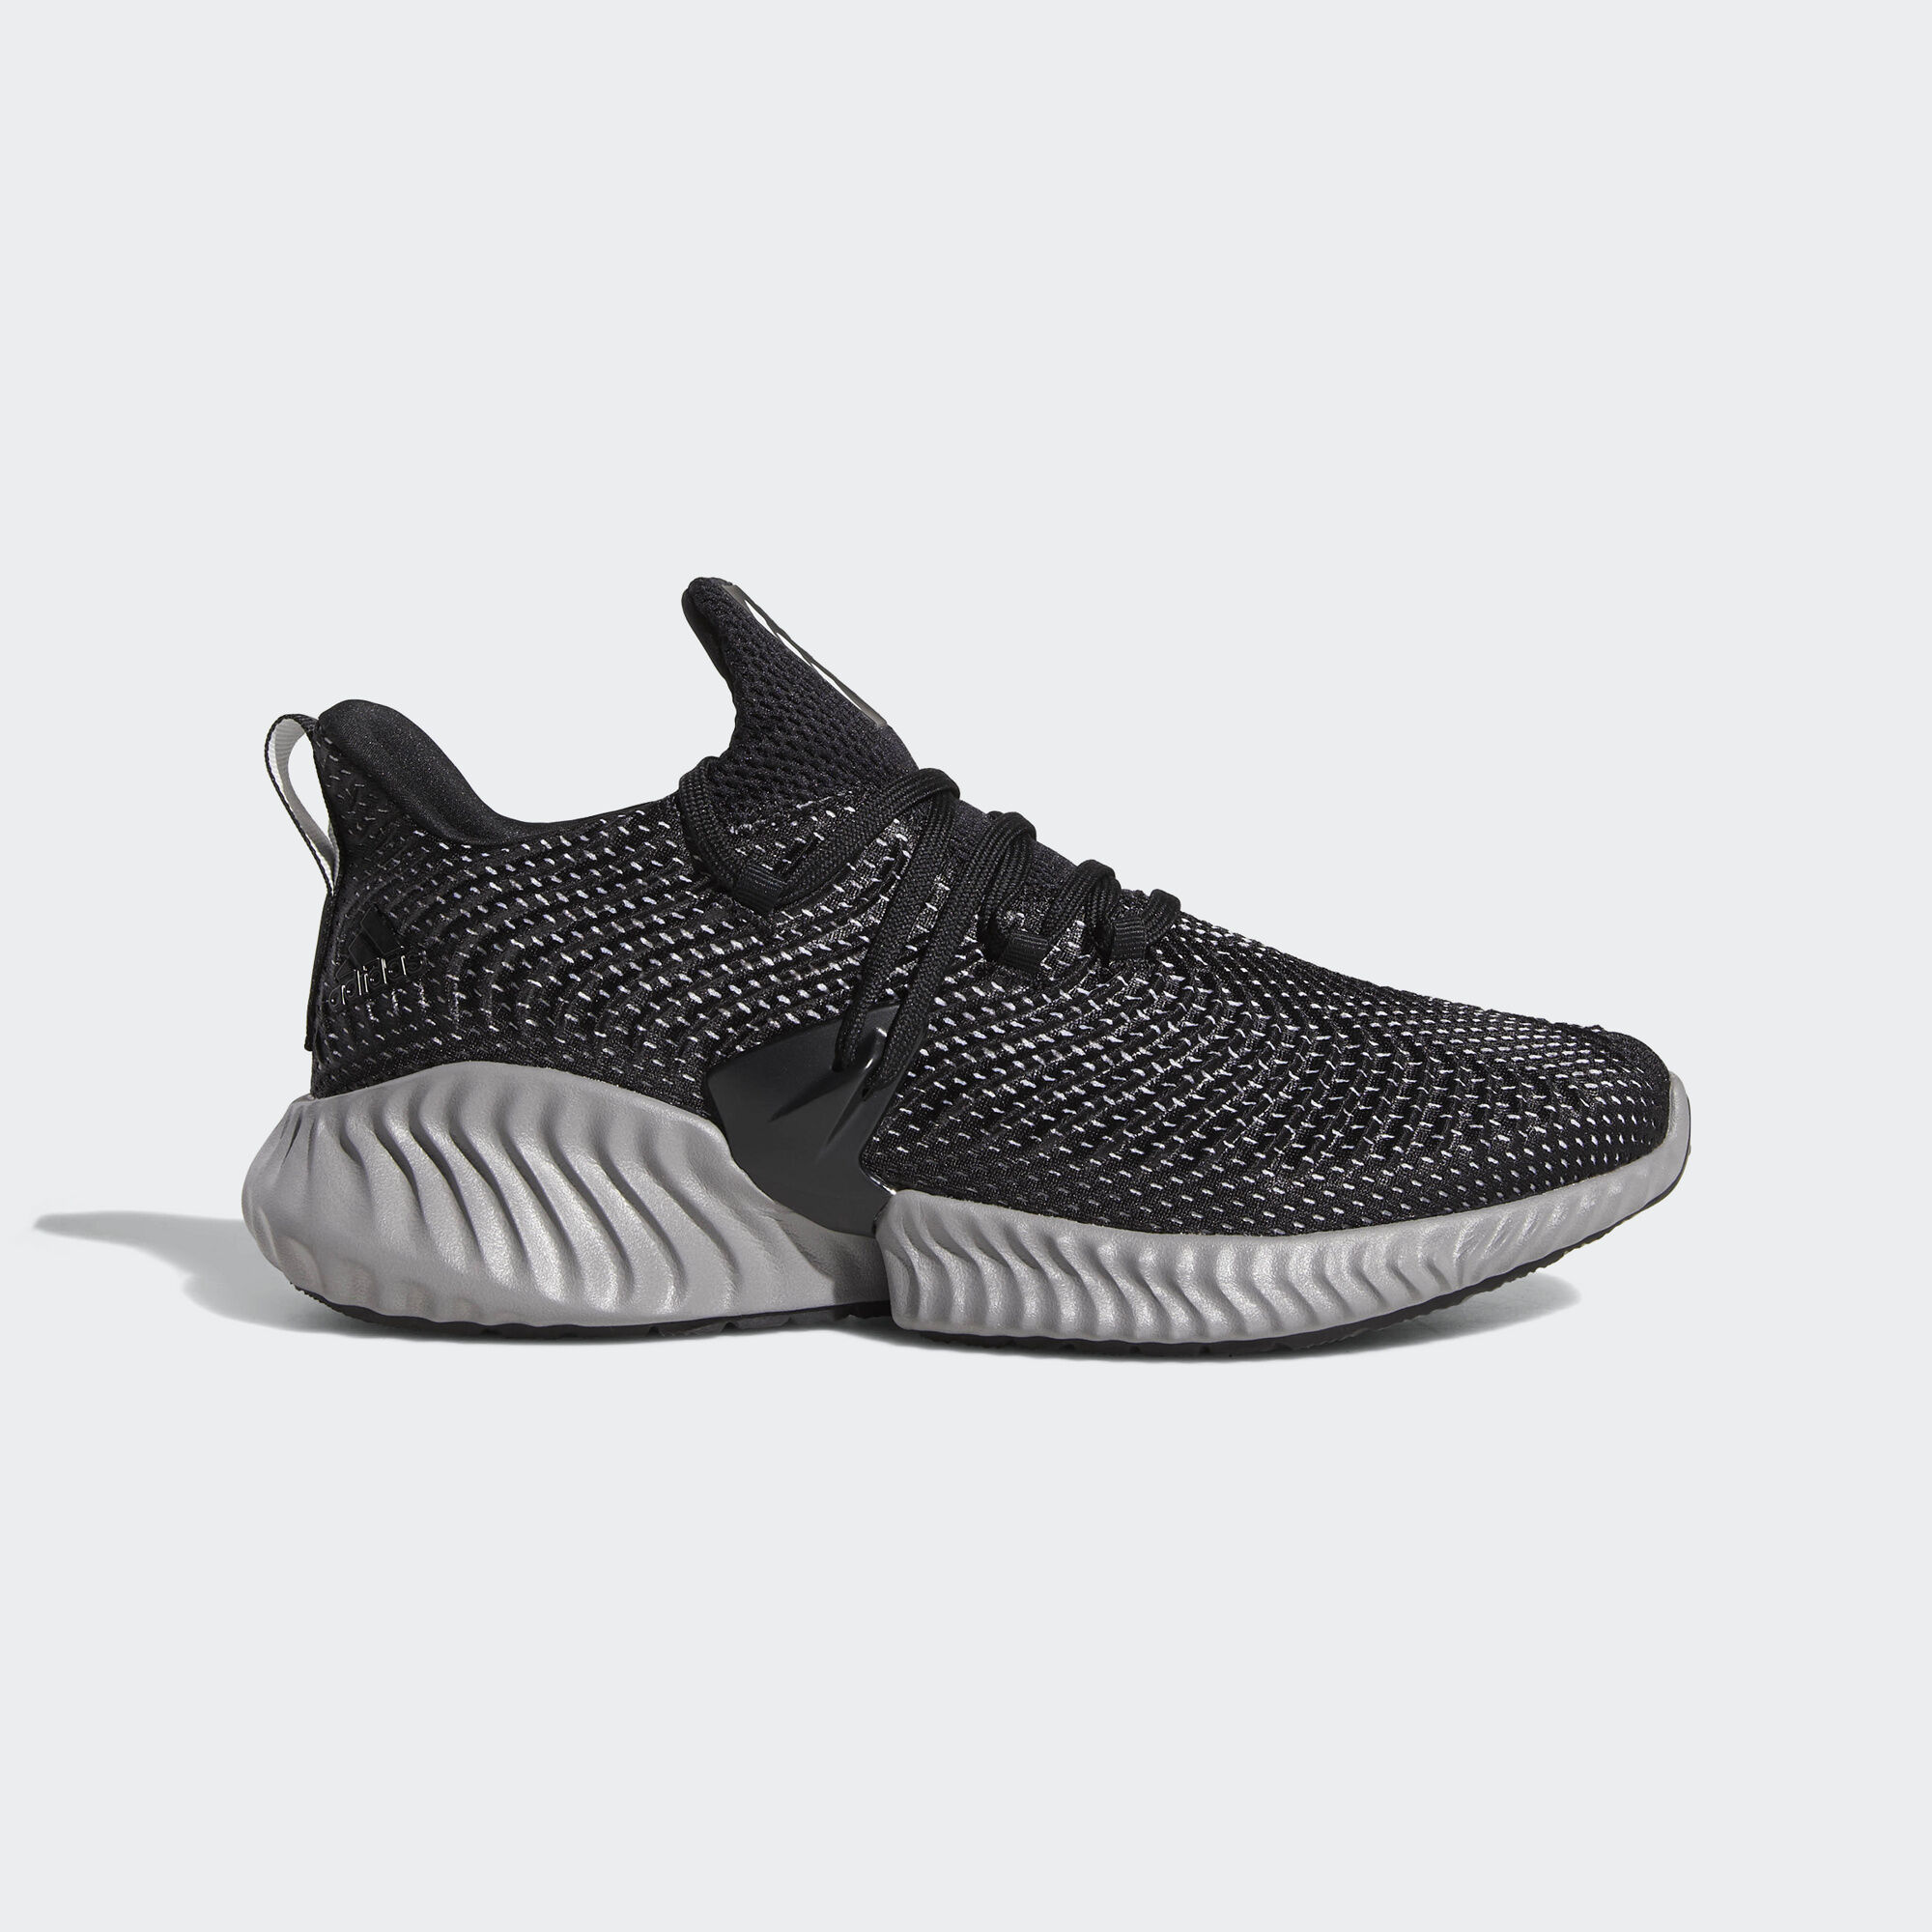 best service de6d0 ada2a adidas - Alphabounce Instinct Shoes Core Black  Ftwr White  Grey Three  BC0626